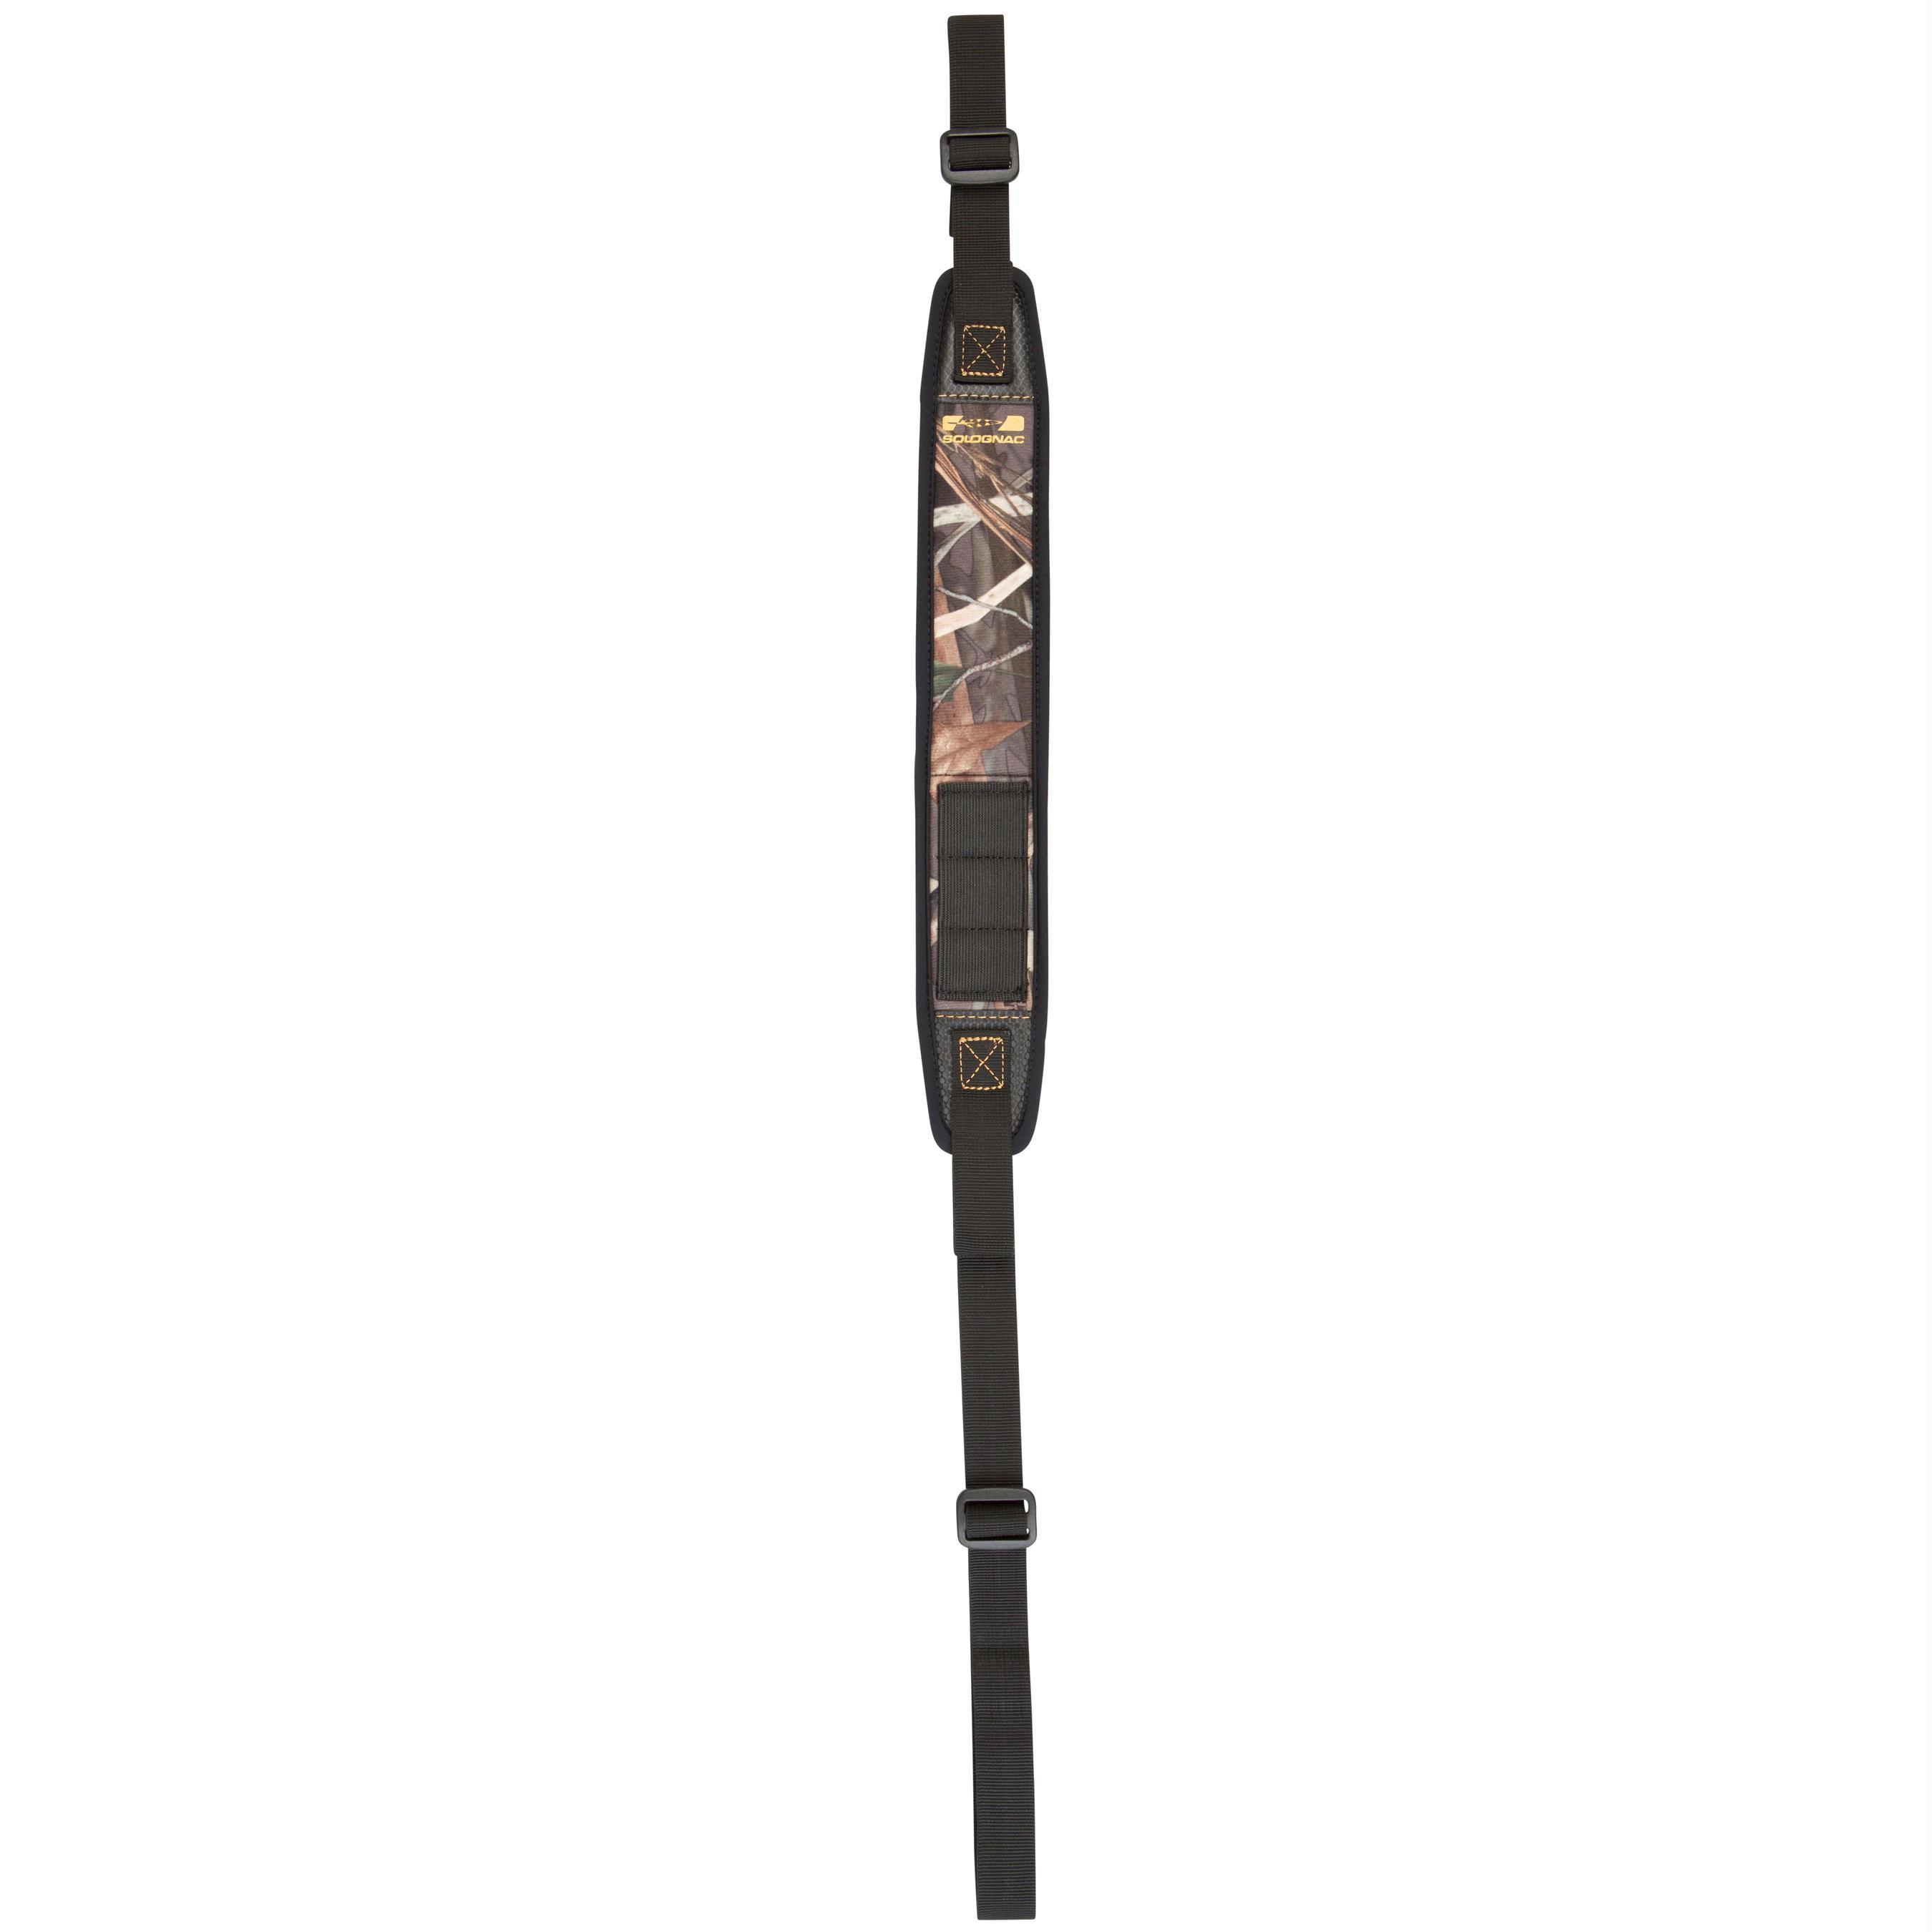 Bretelle chasse fusil 300 néoprène camouflage marais